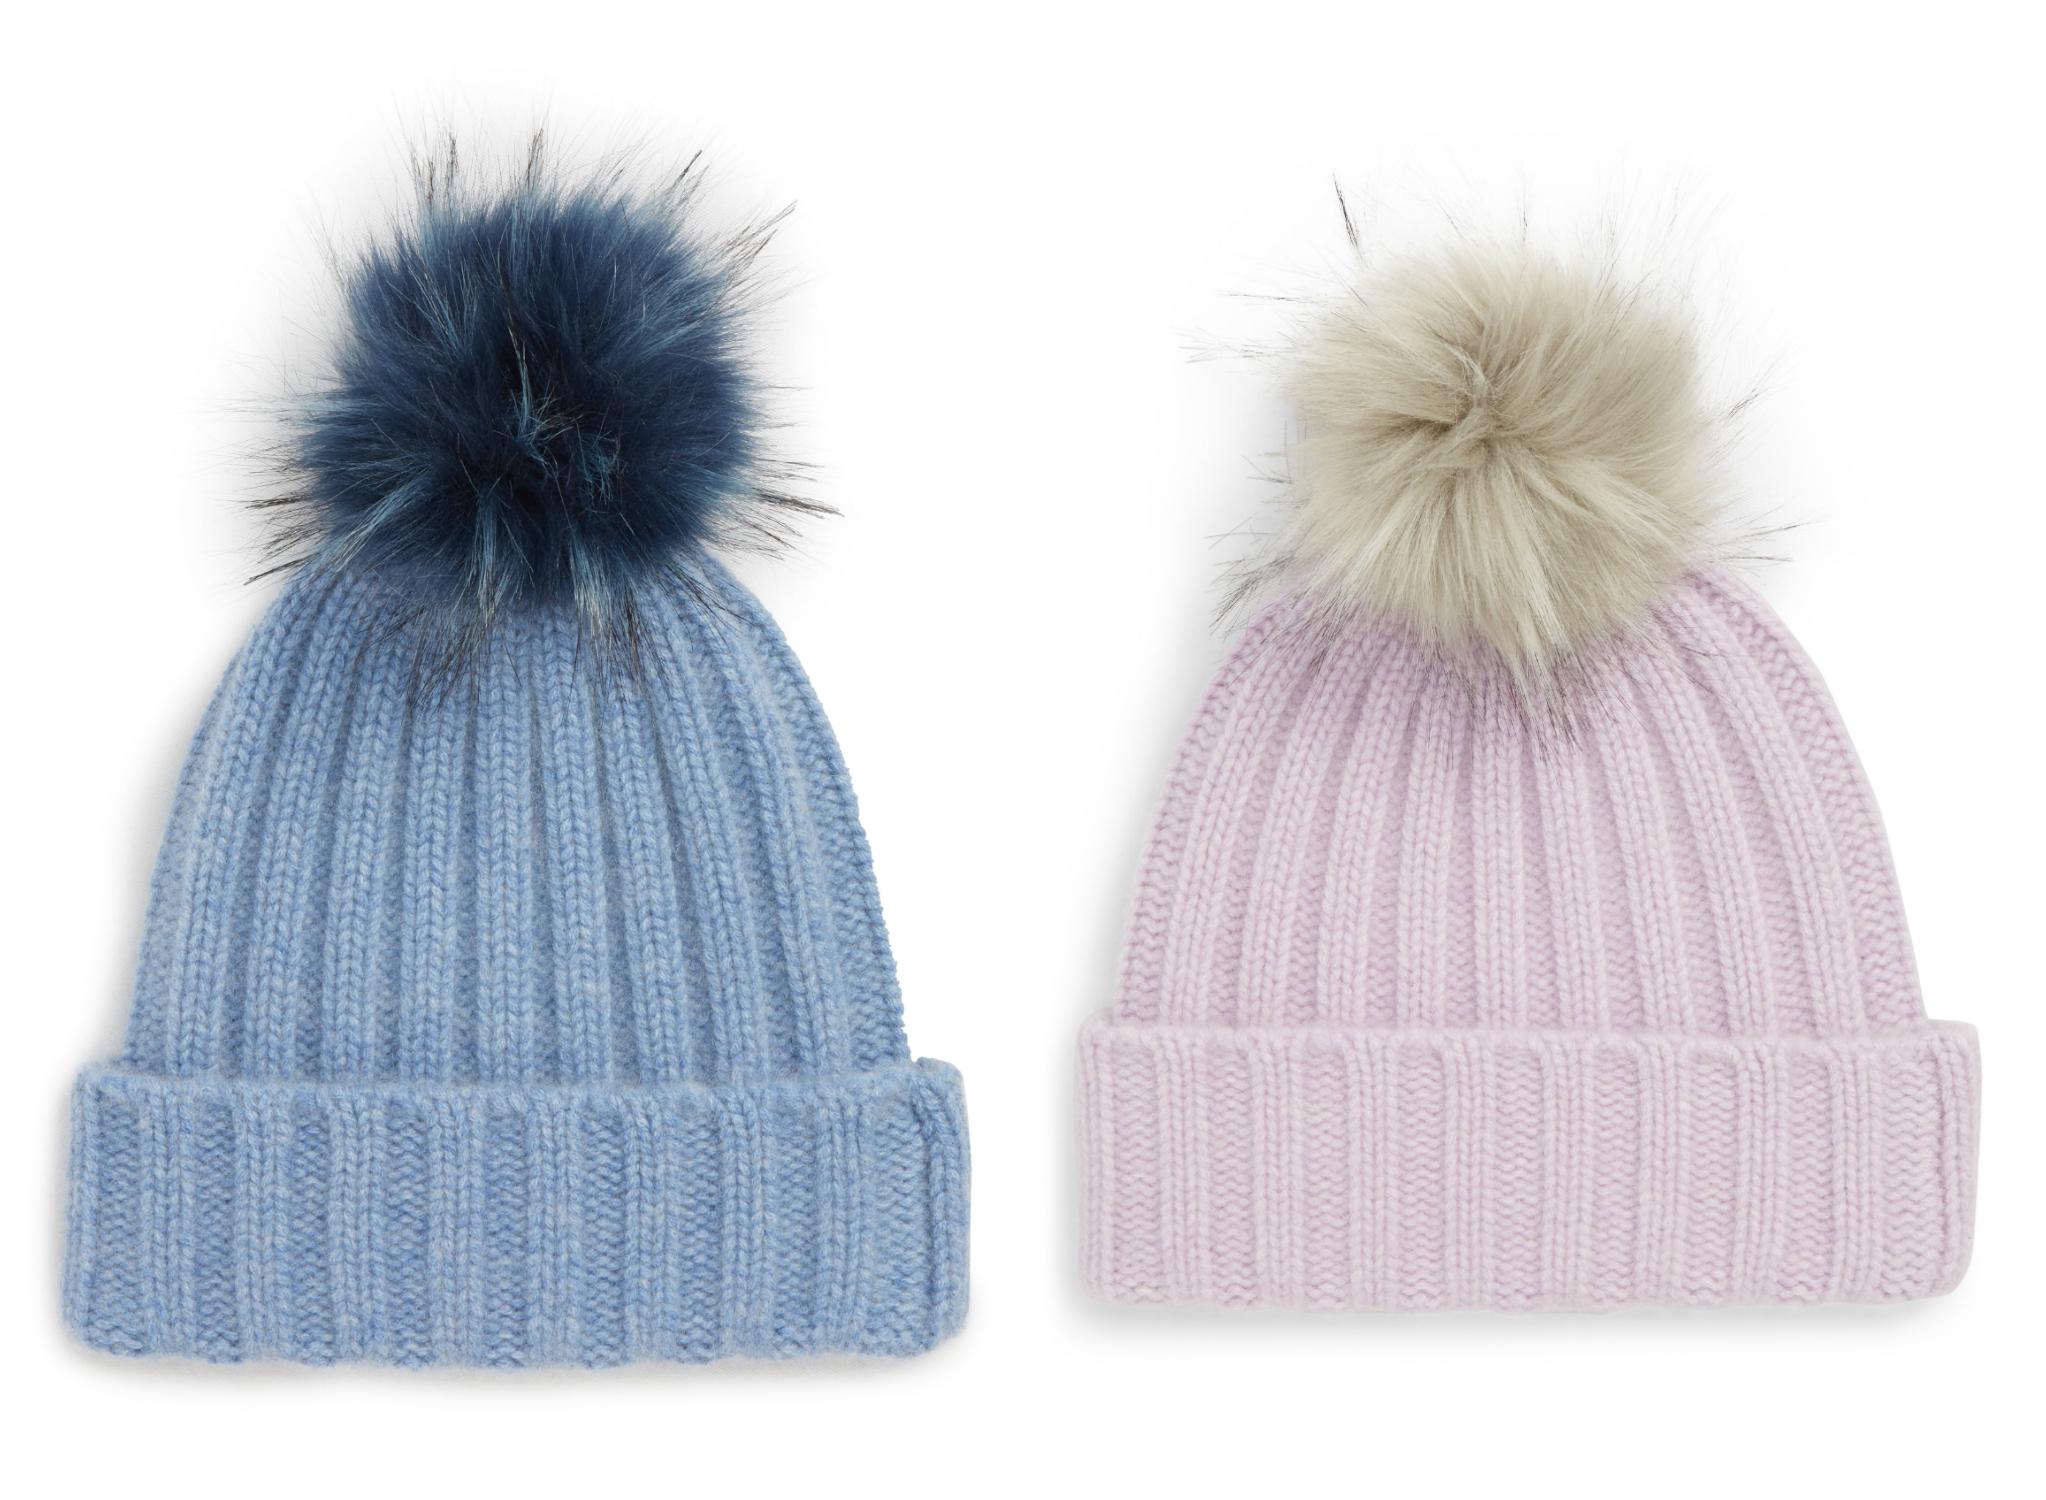 Atlantic_Pacific_Halogen_nordstrom_blair_eadie_fashion_blogger_capsule_collection_fall_october_2018_winter_hat.jpg